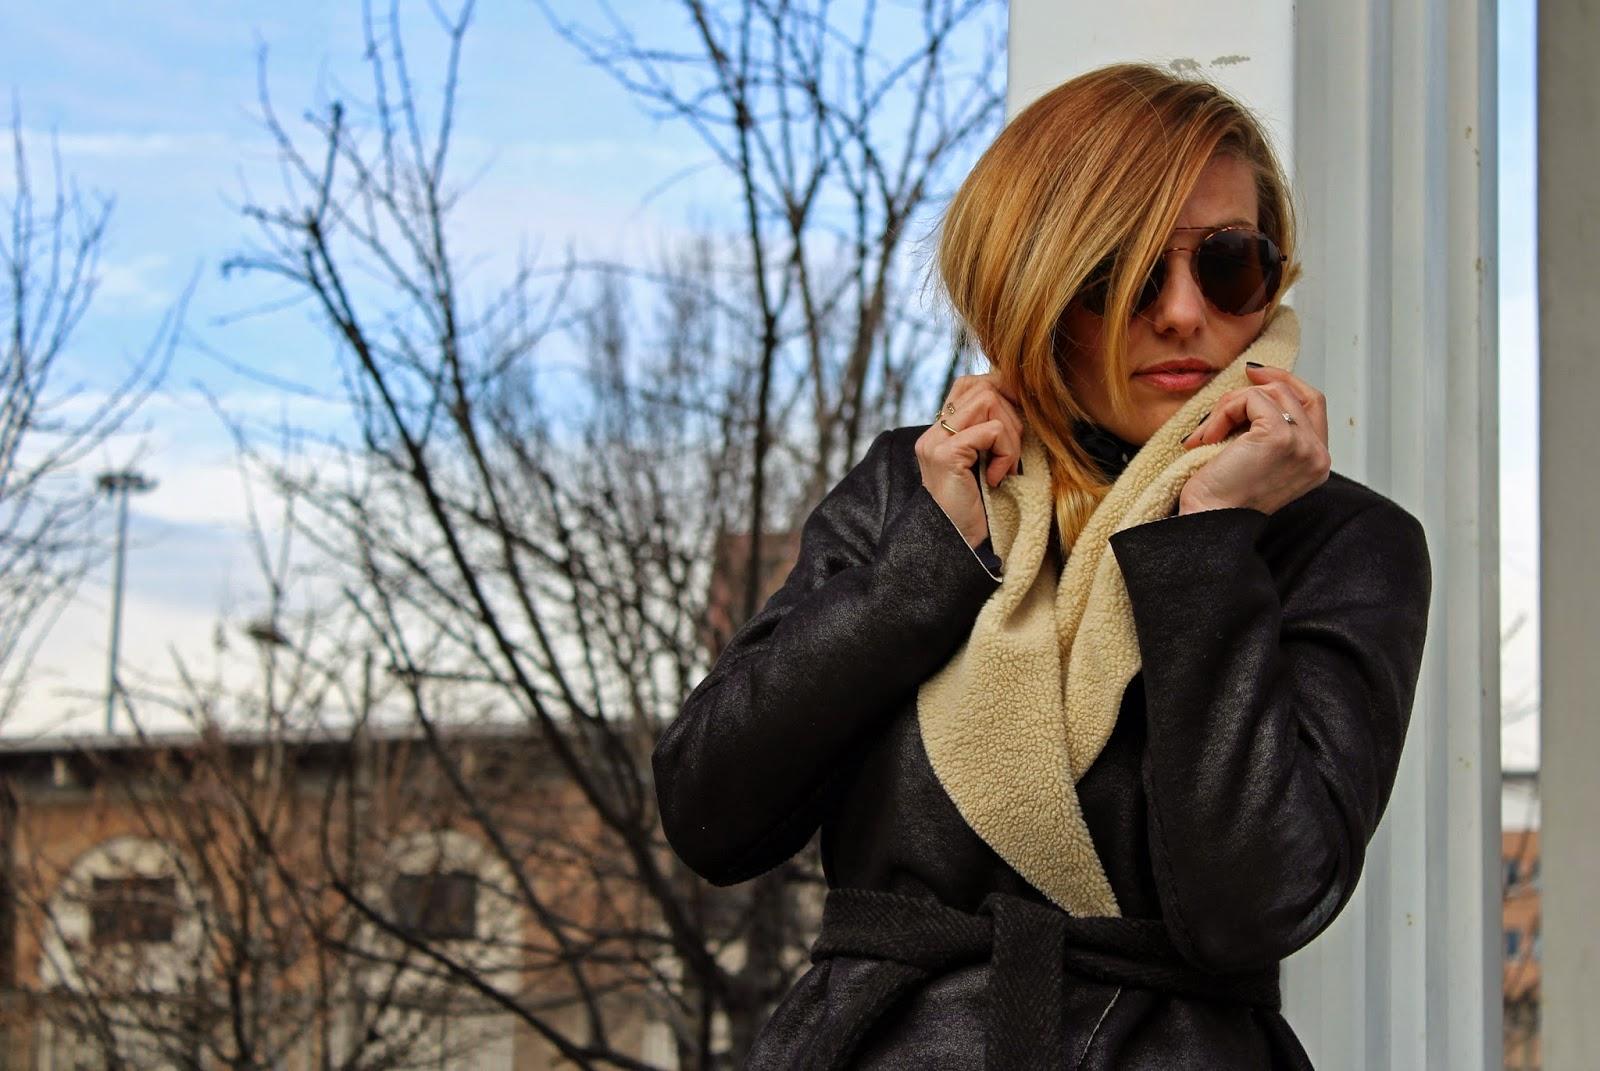 Eniwhere Fashion - Montone Michelle Windheuser